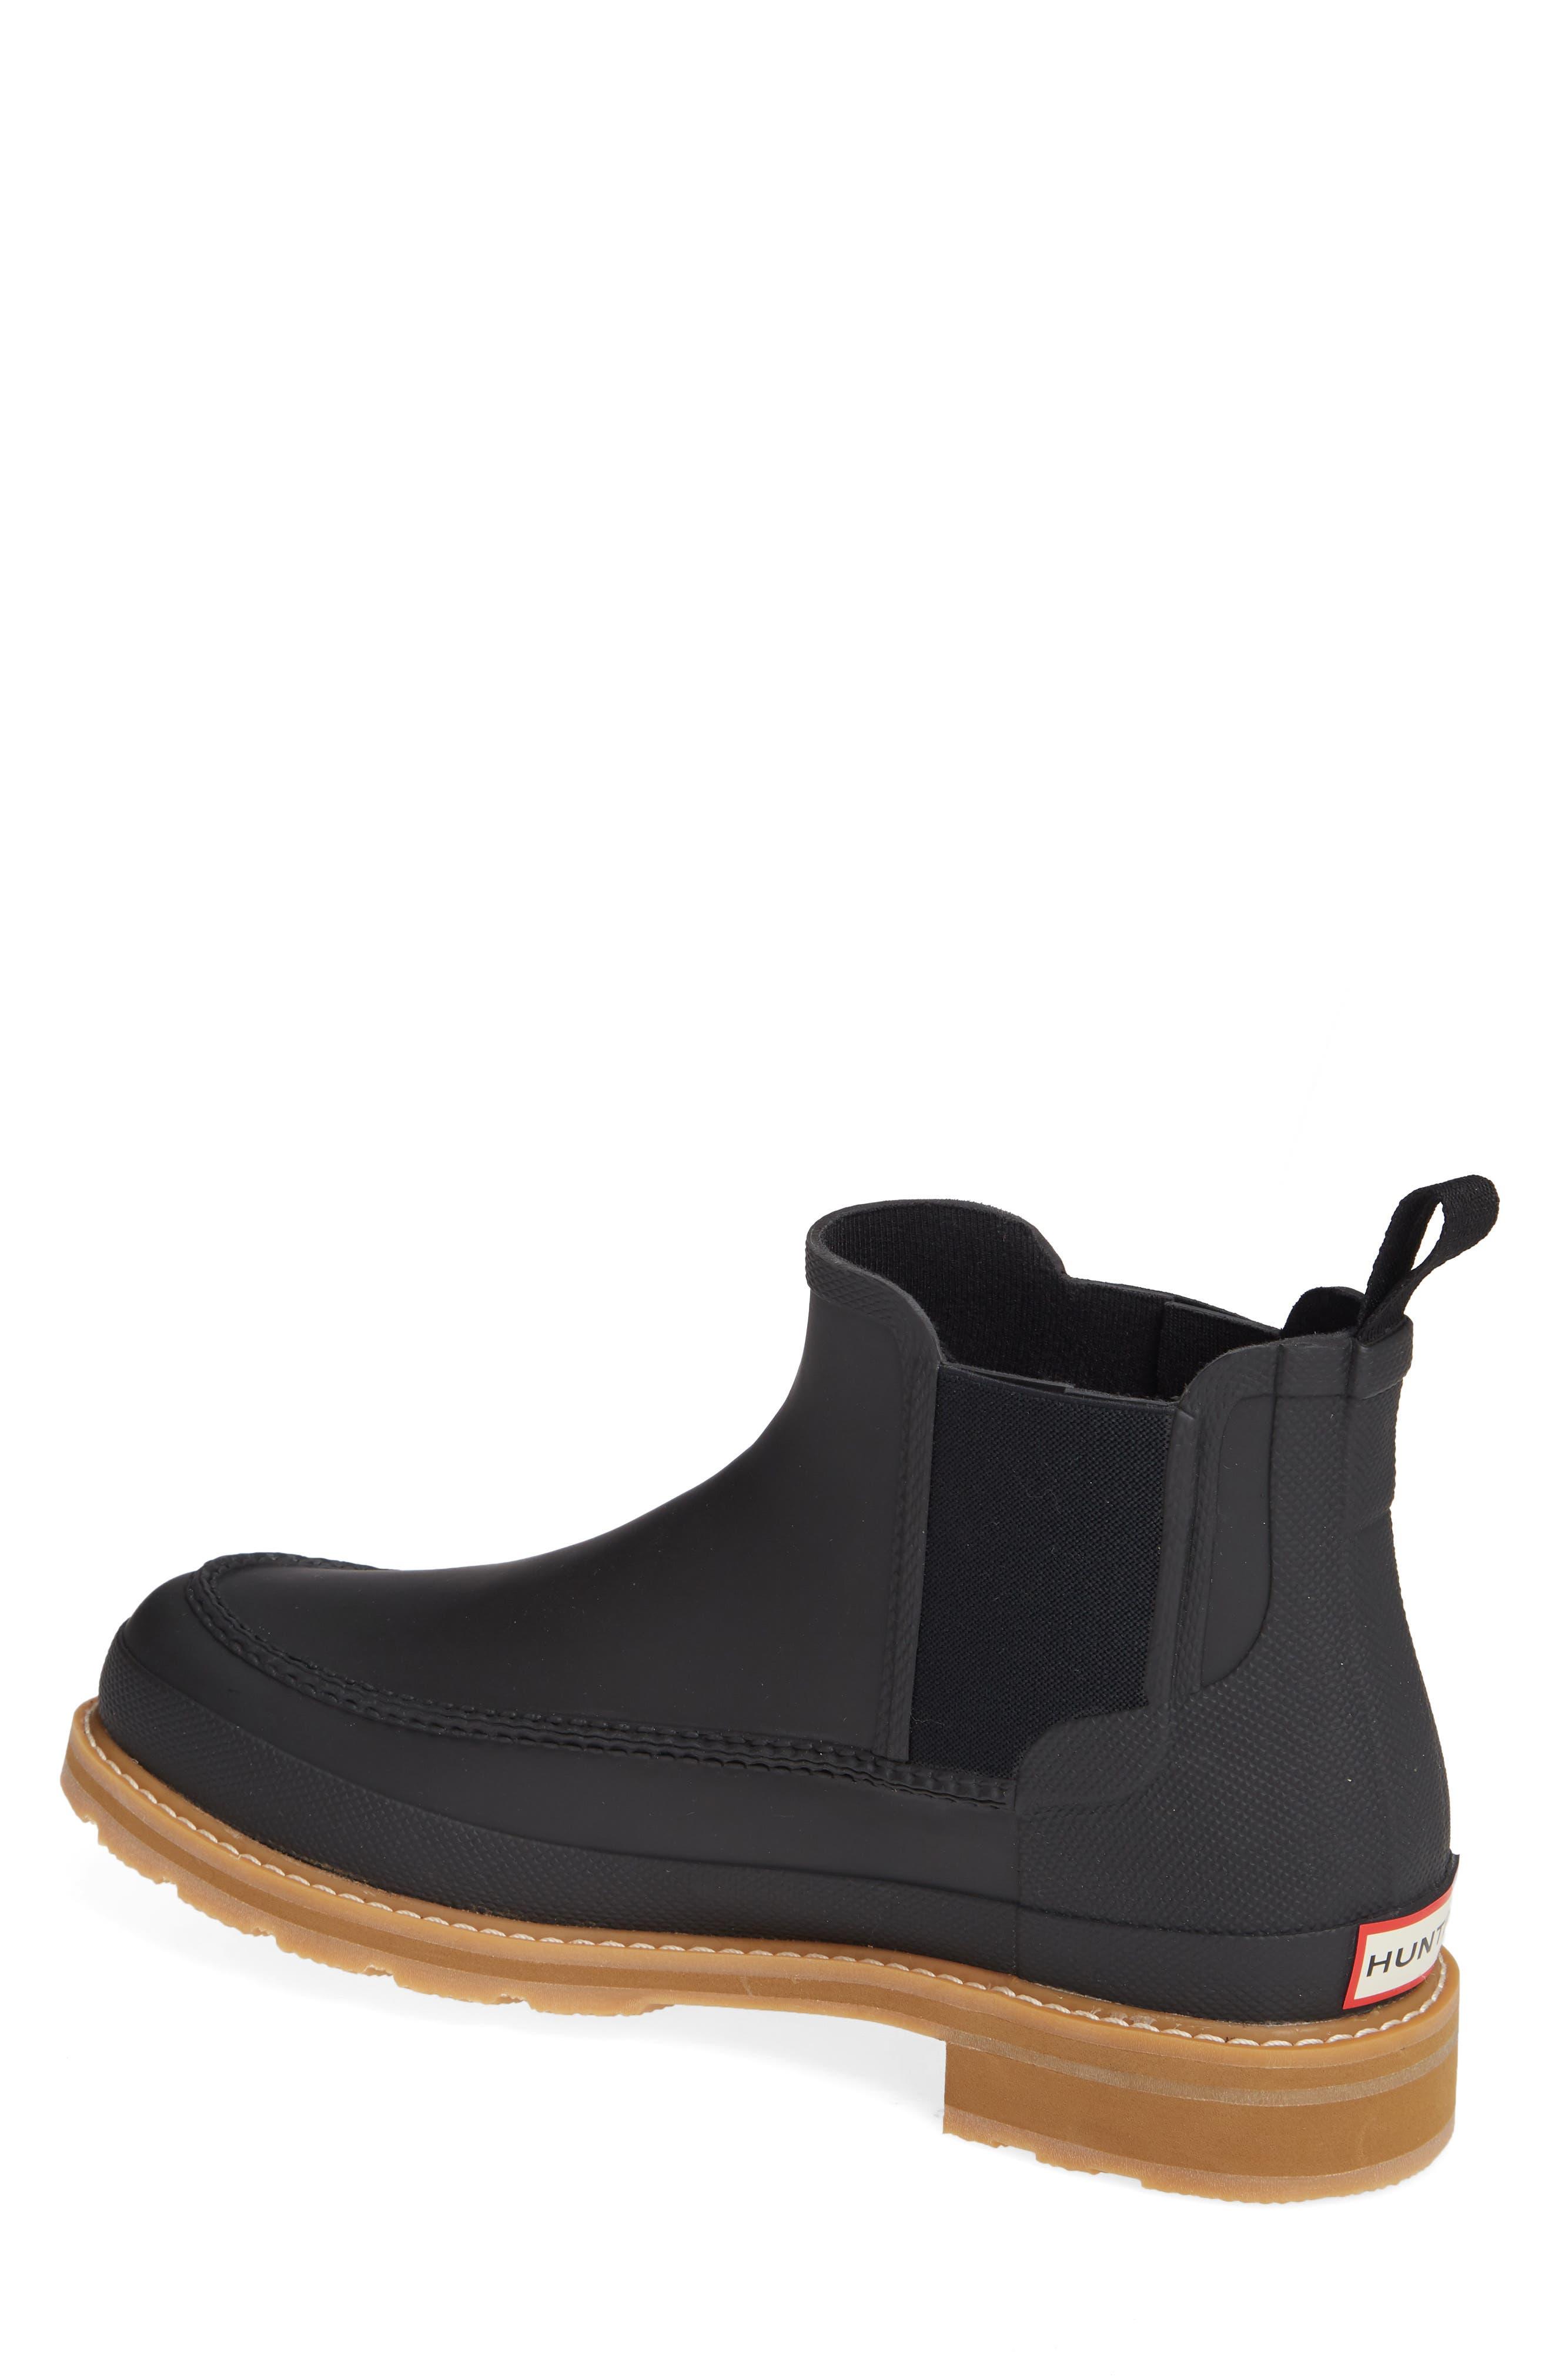 HUNTER,                             Moc Toe Waterproof Chelsea Boot,                             Alternate thumbnail 2, color,                             BLACK